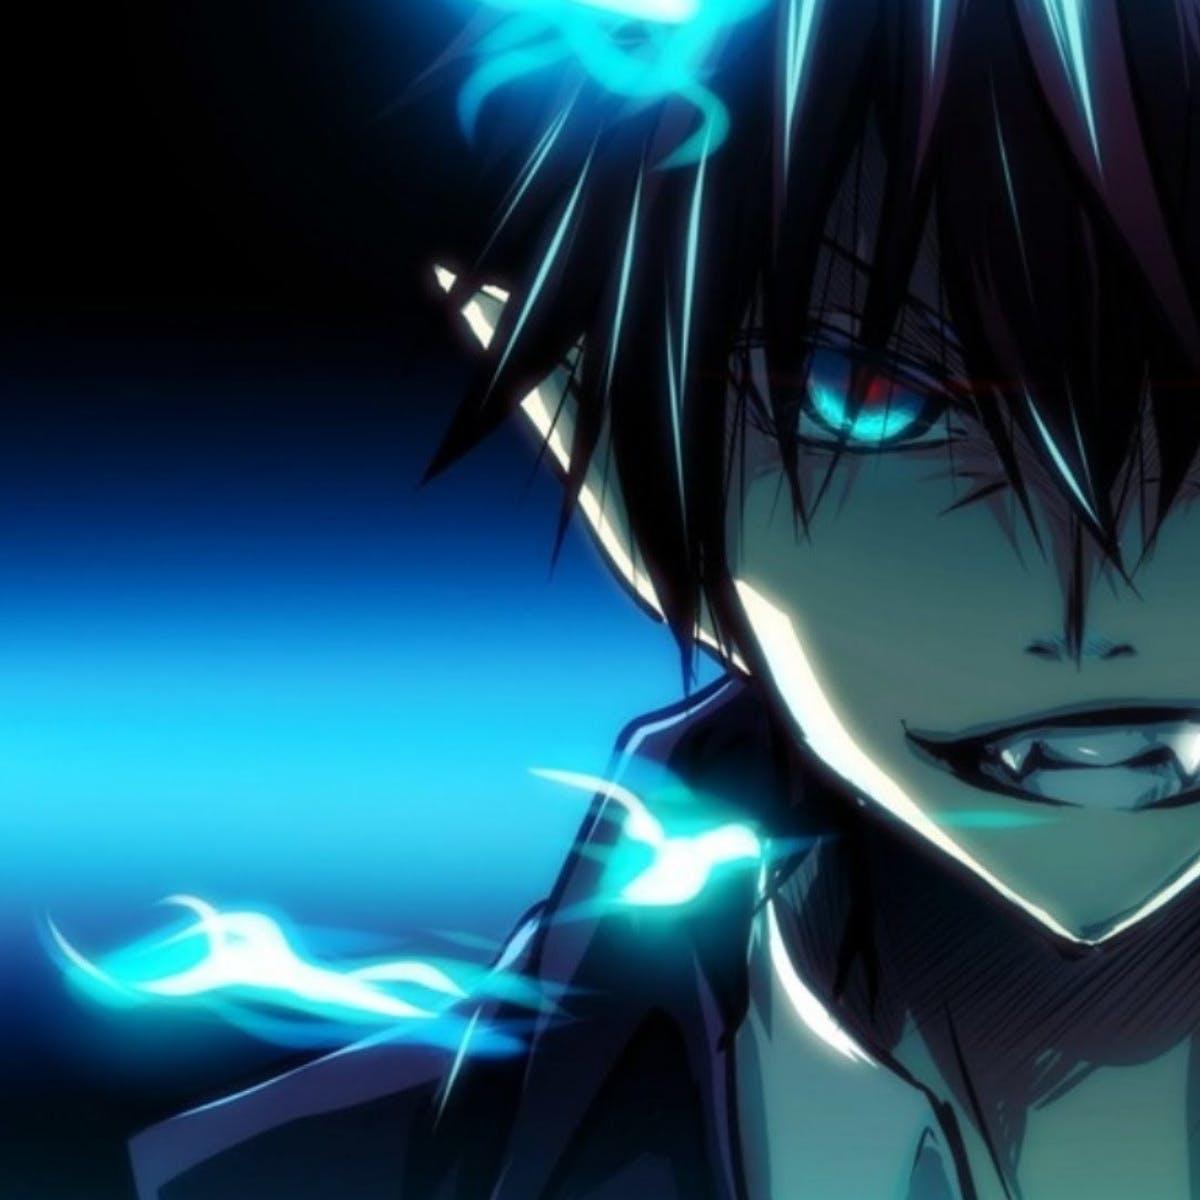 Ao No Exorcist Season 2 Timeline Dowload Anime Wallpaper Hd Blue exorcist was an anime series that ran from 2011 to 2017. ao no exorcist season 2 timeline